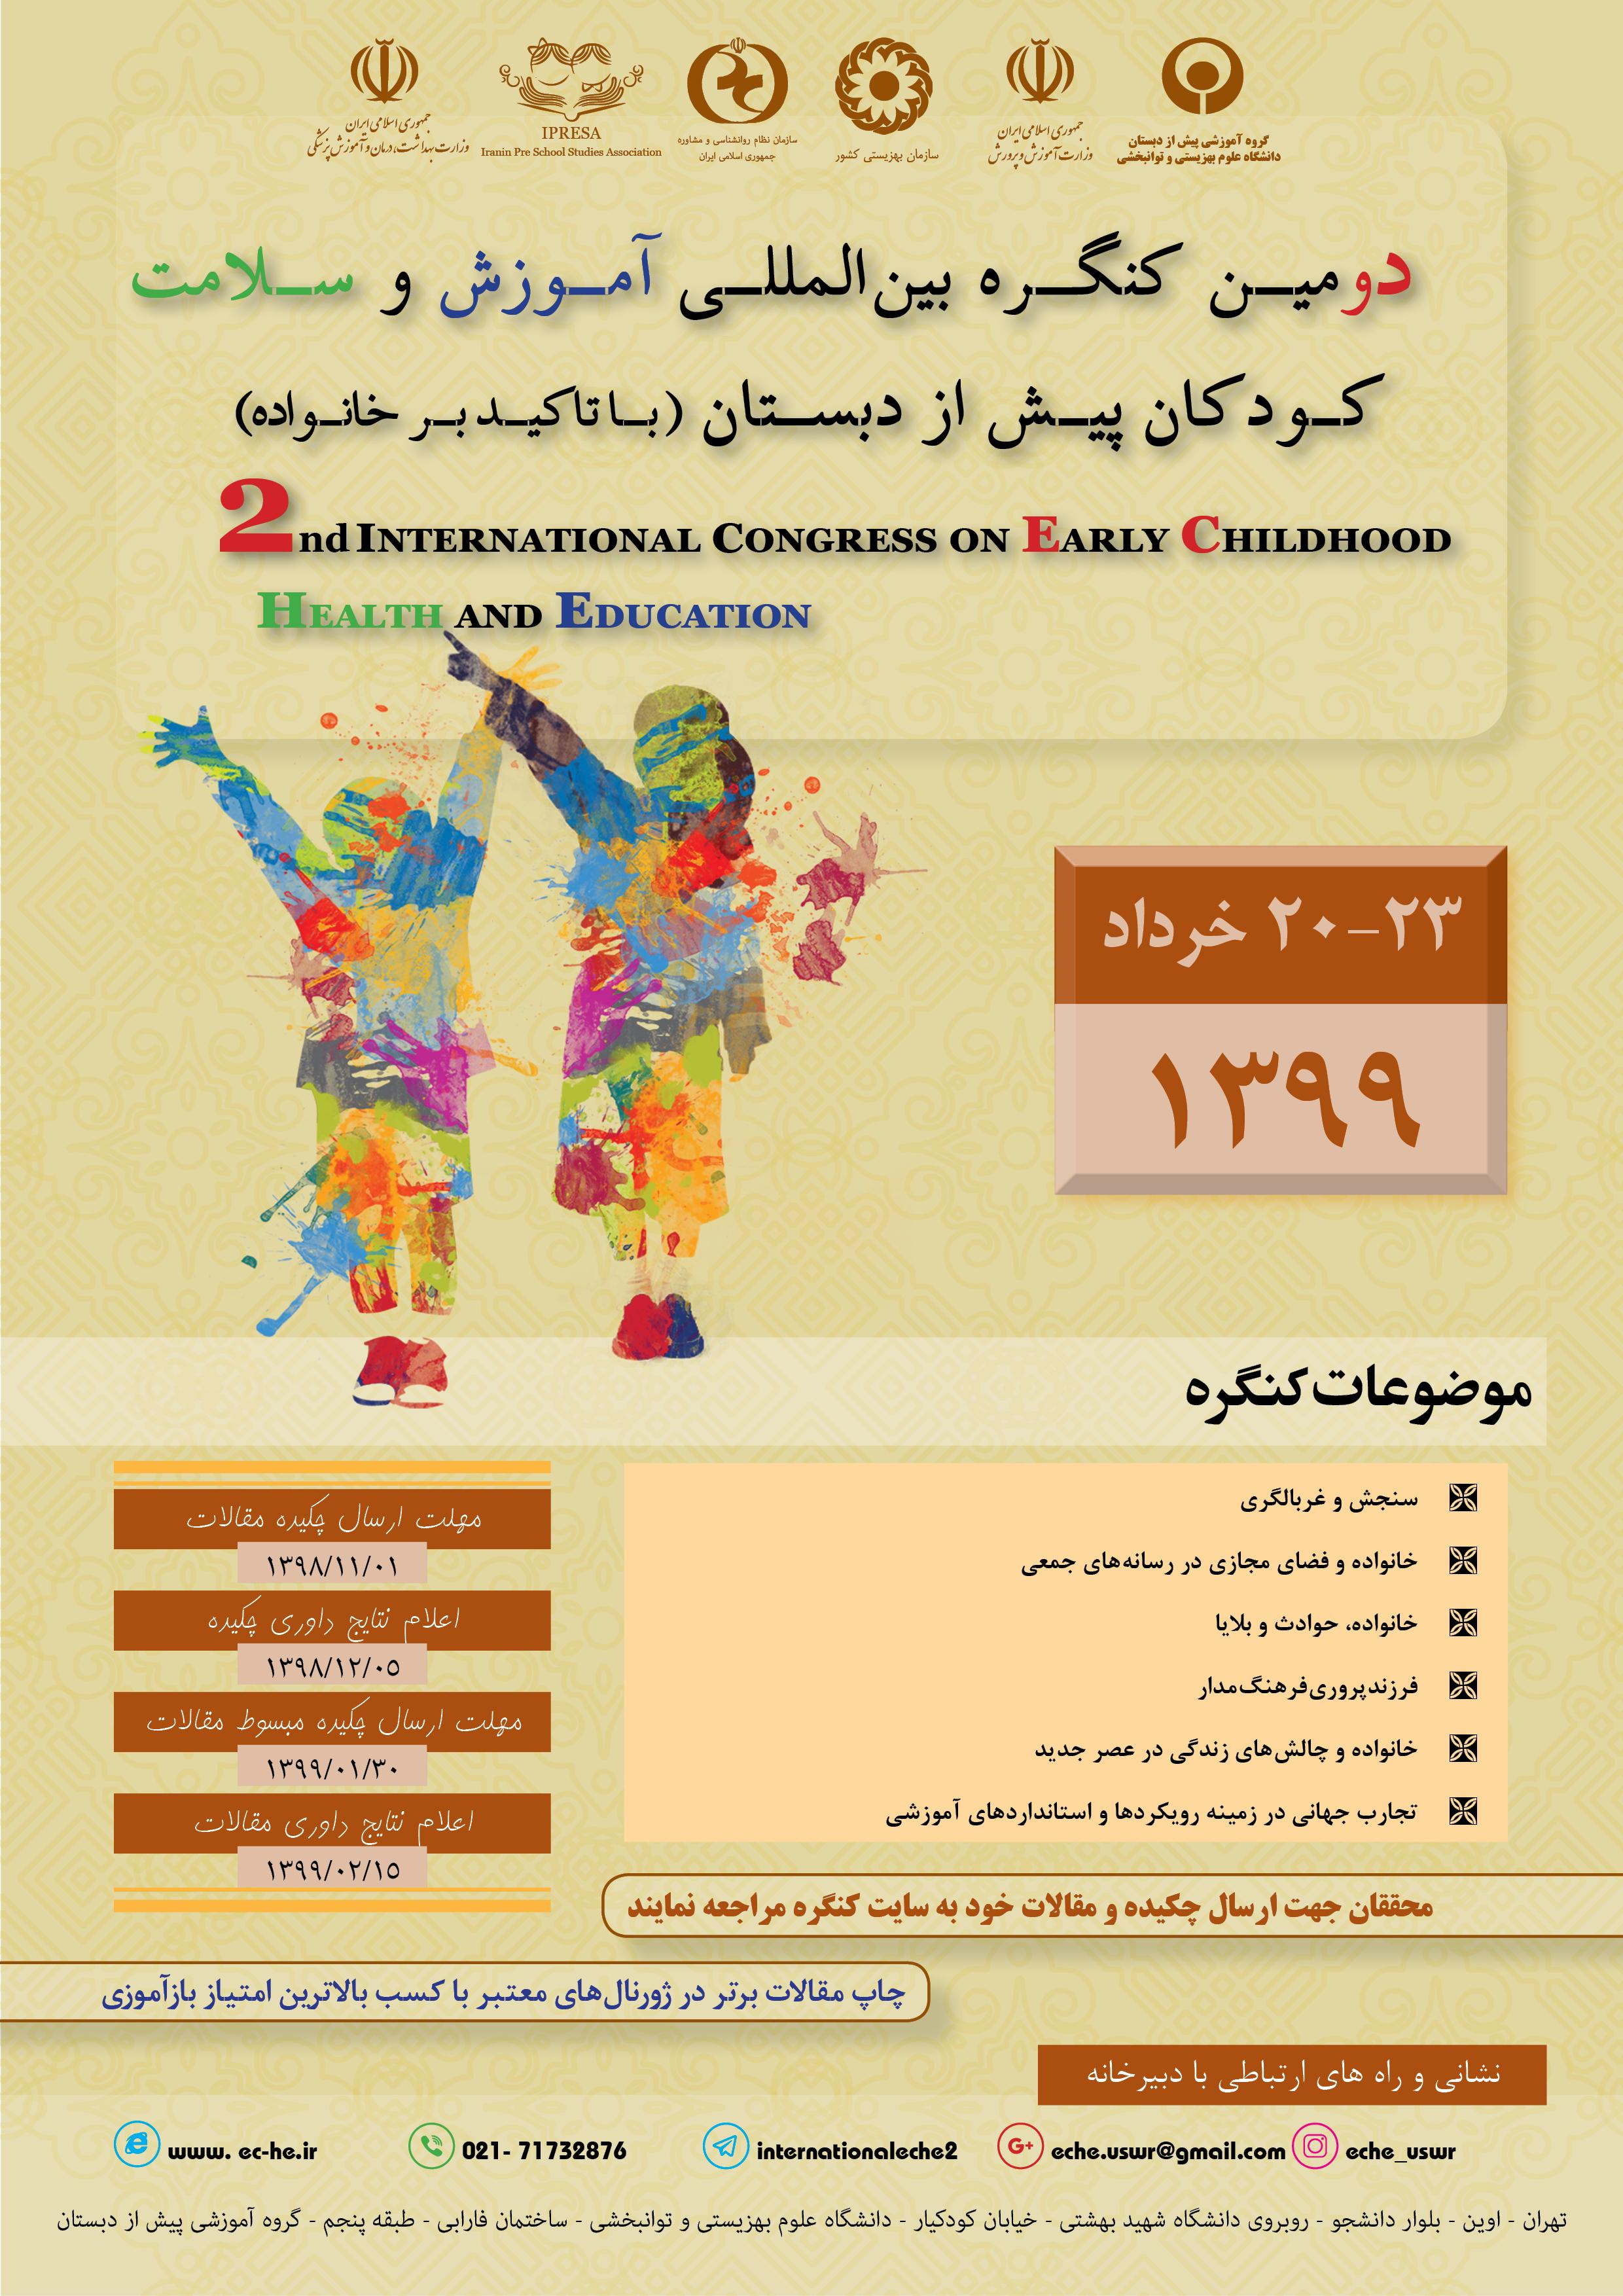 farsi - دومین کنگره بین المللی آموزش و سلامت کودکان پیش از دبستان خرداد 99